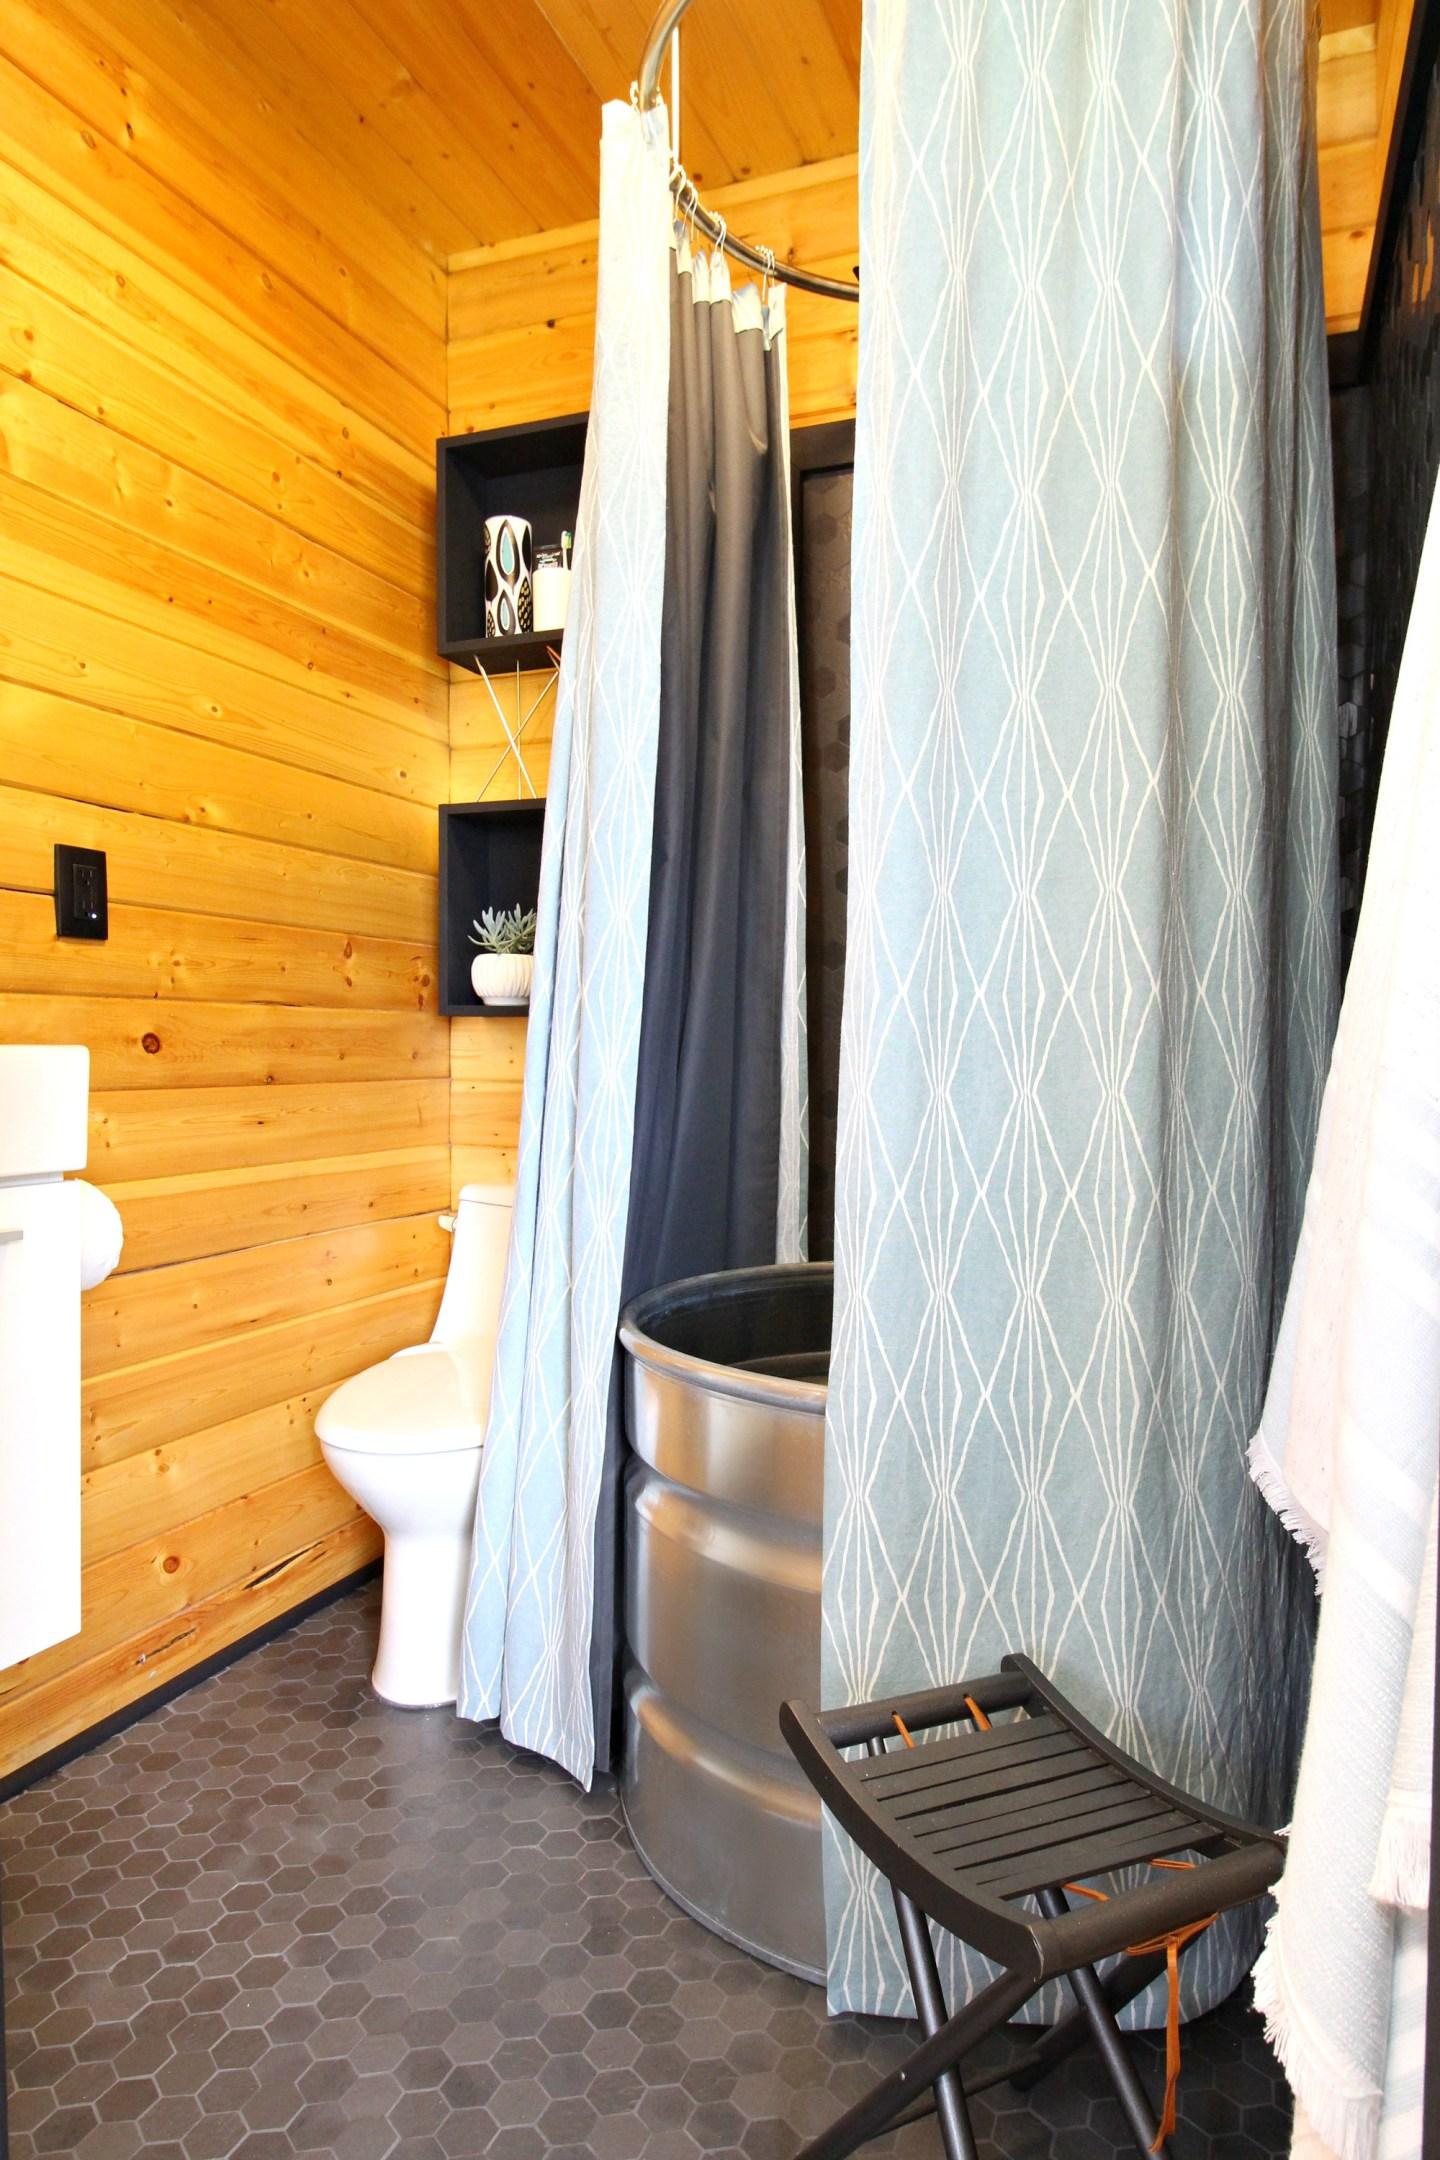 Learn How to Make a DIY Stock Tank Shower Using a Stock Tank from Tarter USA #stocktank #diy #bunkie #bunkiebathroom #diyhomedecor